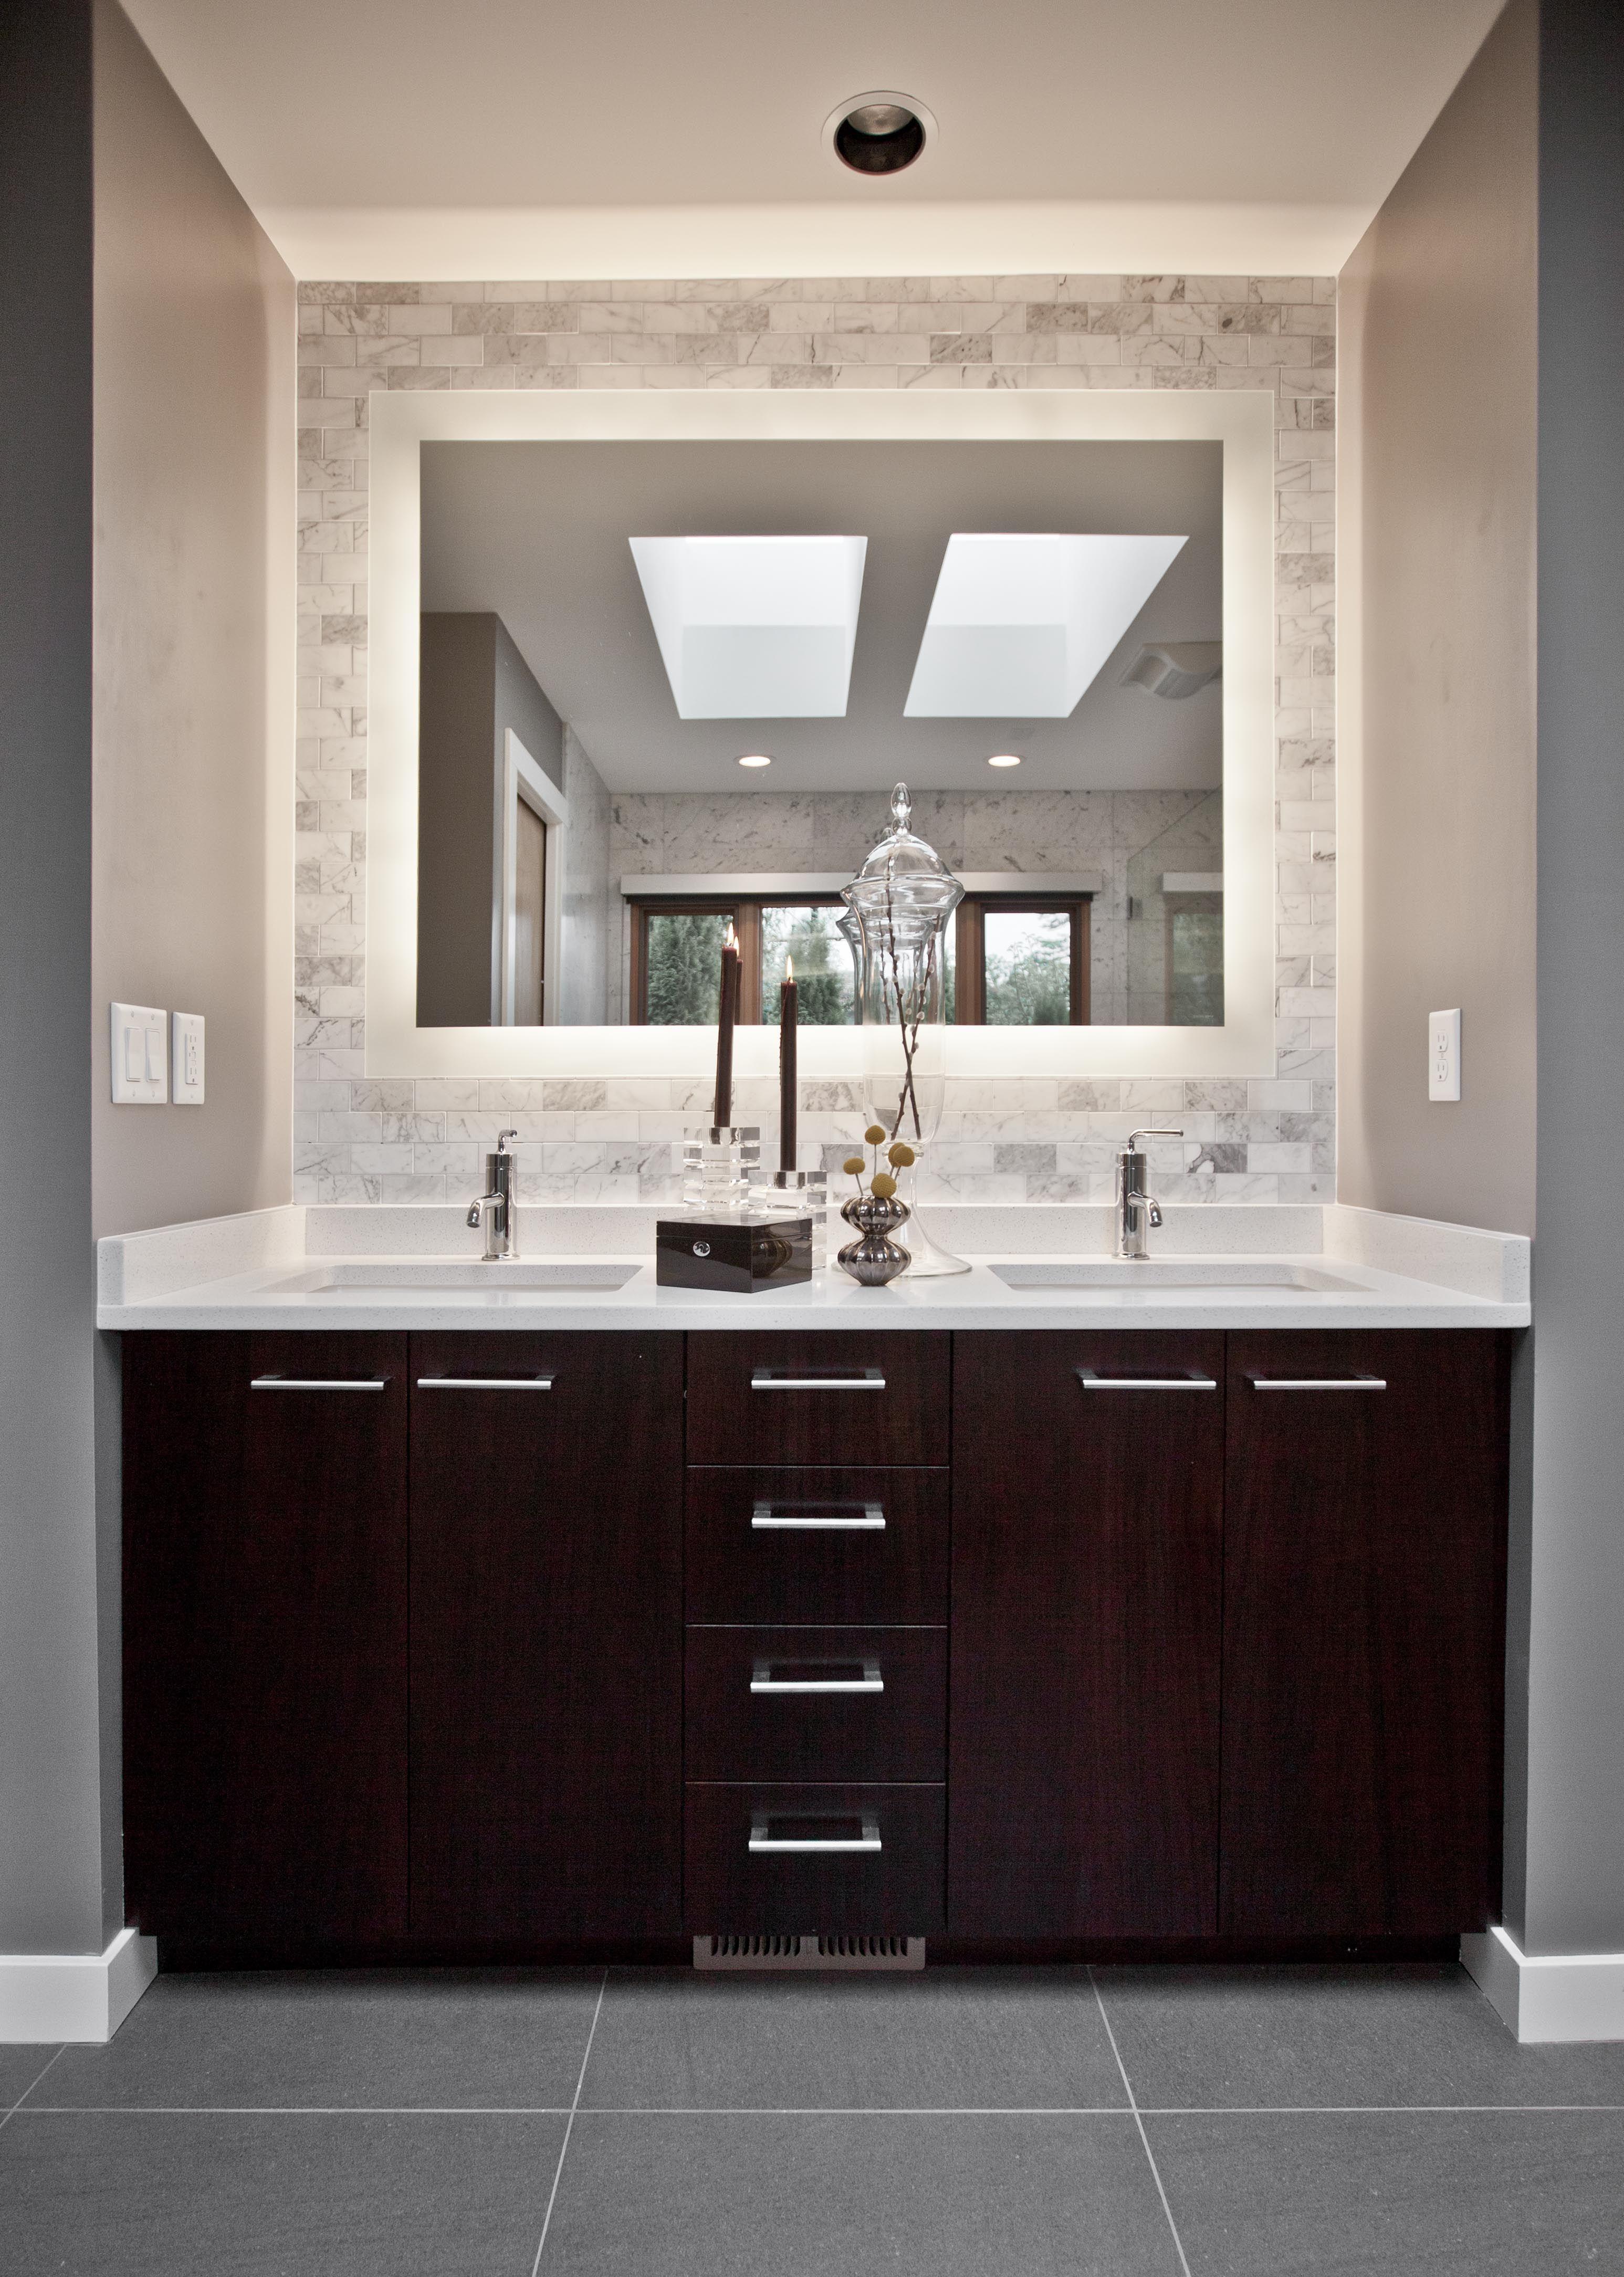 45 RELAXING BATHROOM VANITY INSPIRATIONS | My Dream Home ...